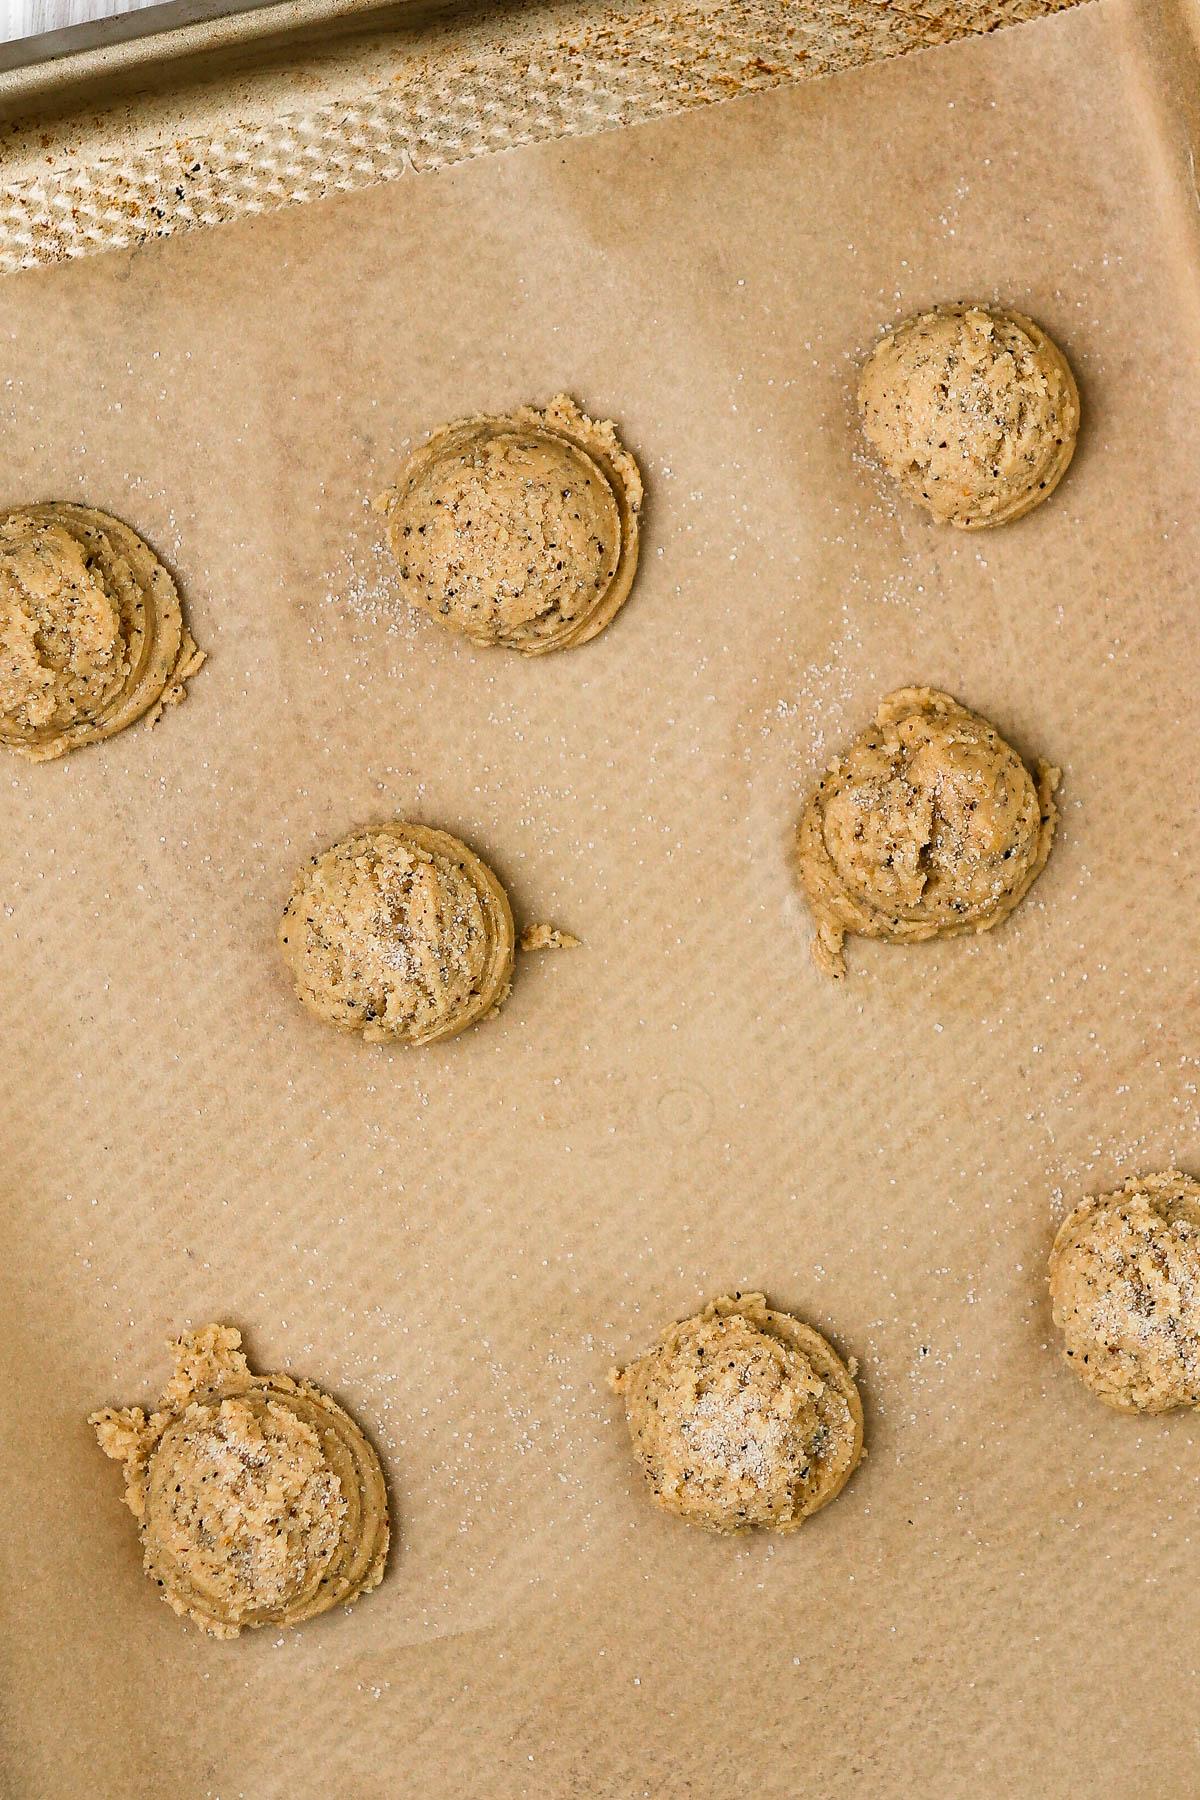 cookie dough balls before baking.